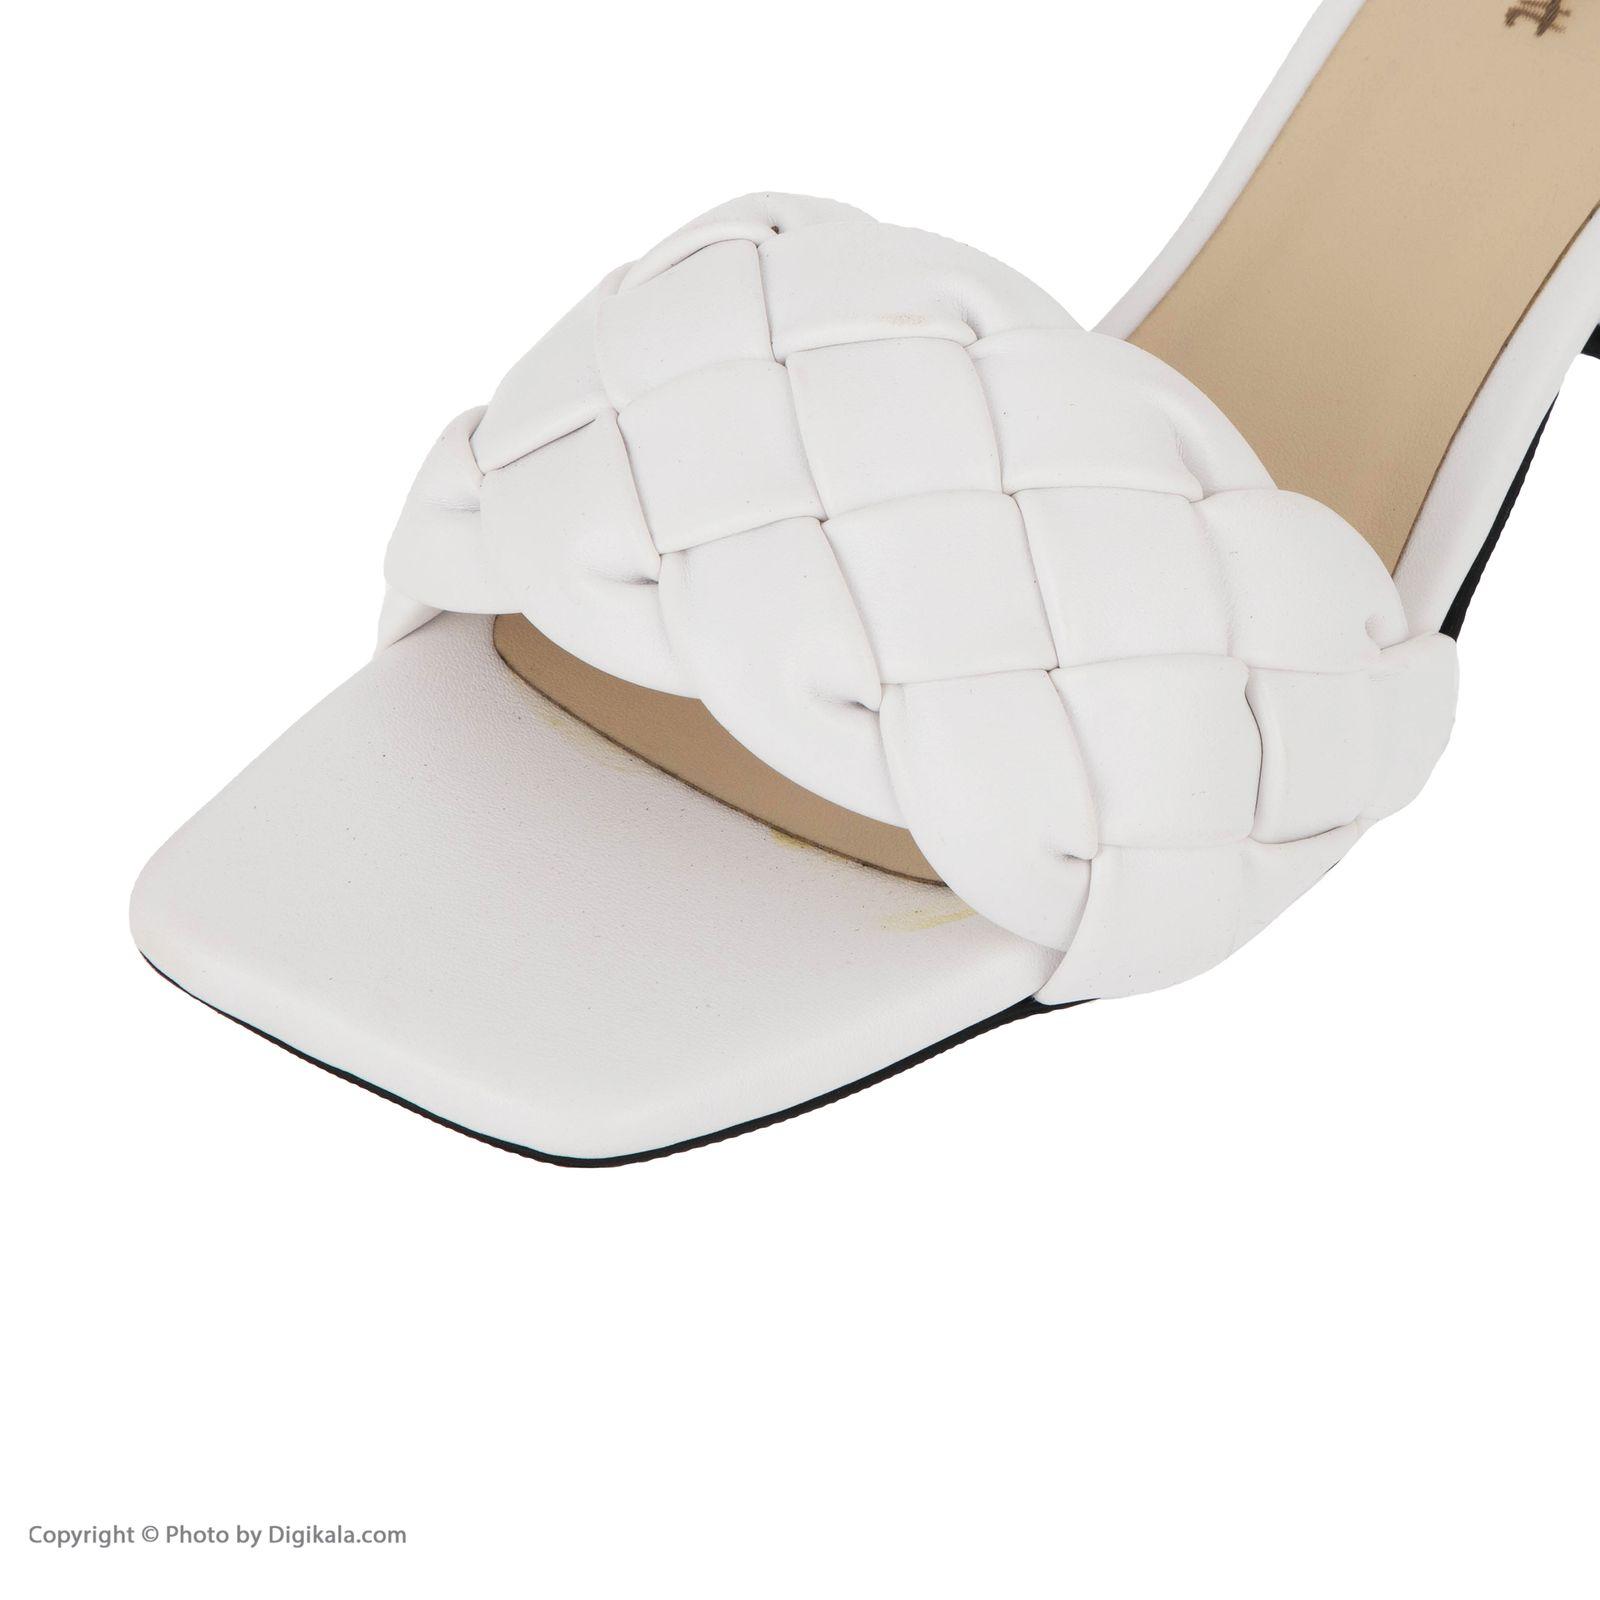 صندل زنانه کیتو کیت مدل بیتا کد 06 -  - 3